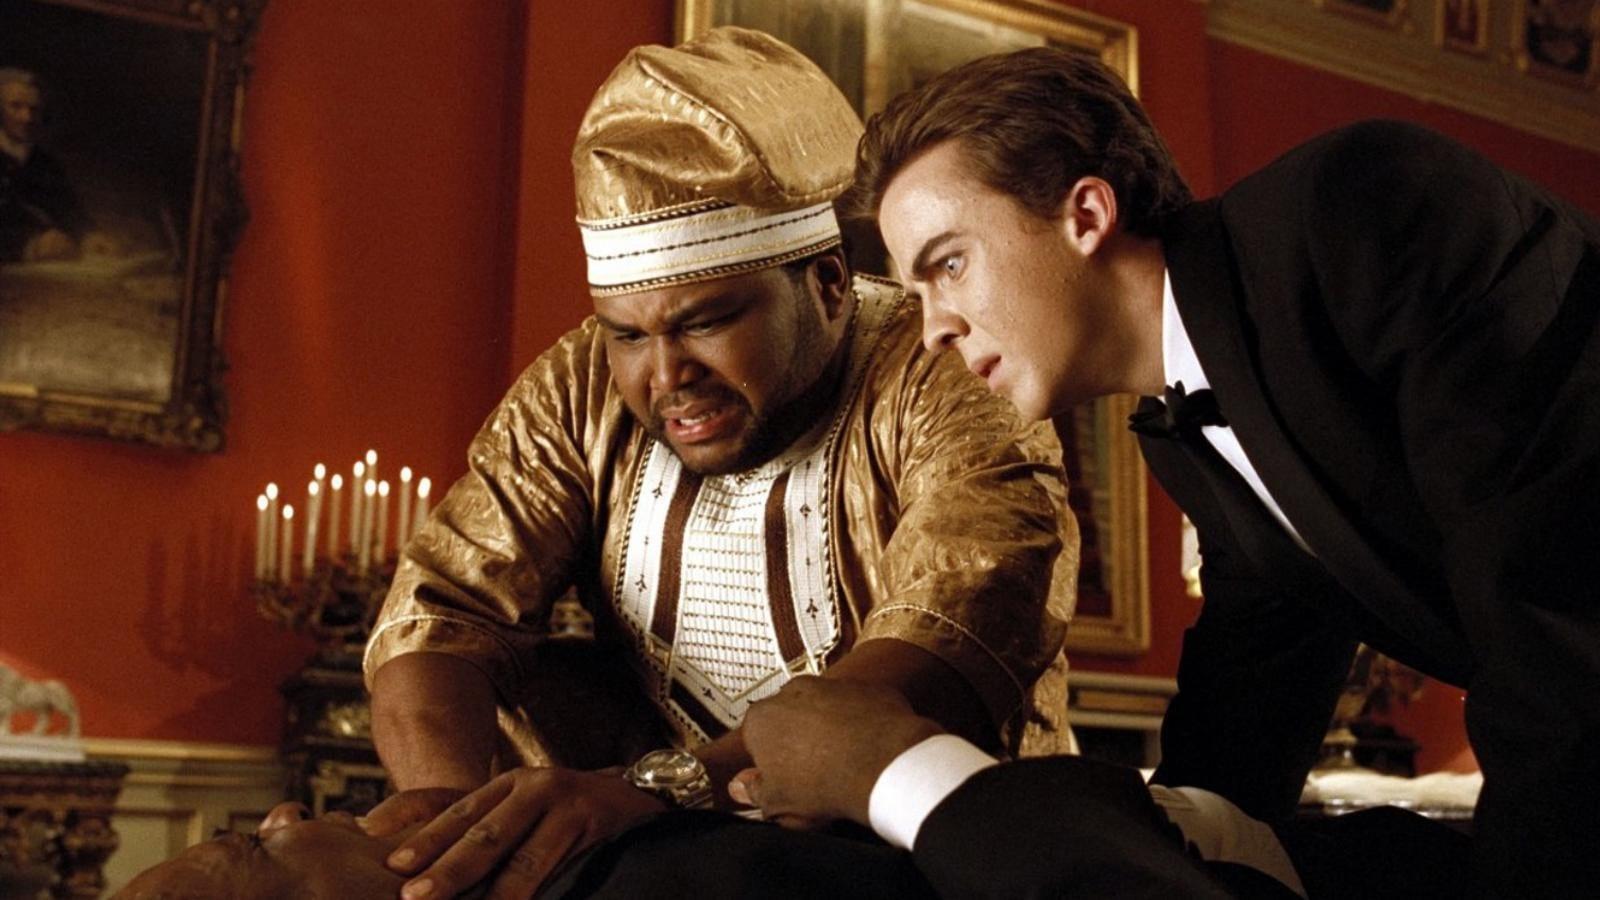 Agent Cody Banks 2: Destination London (2004)